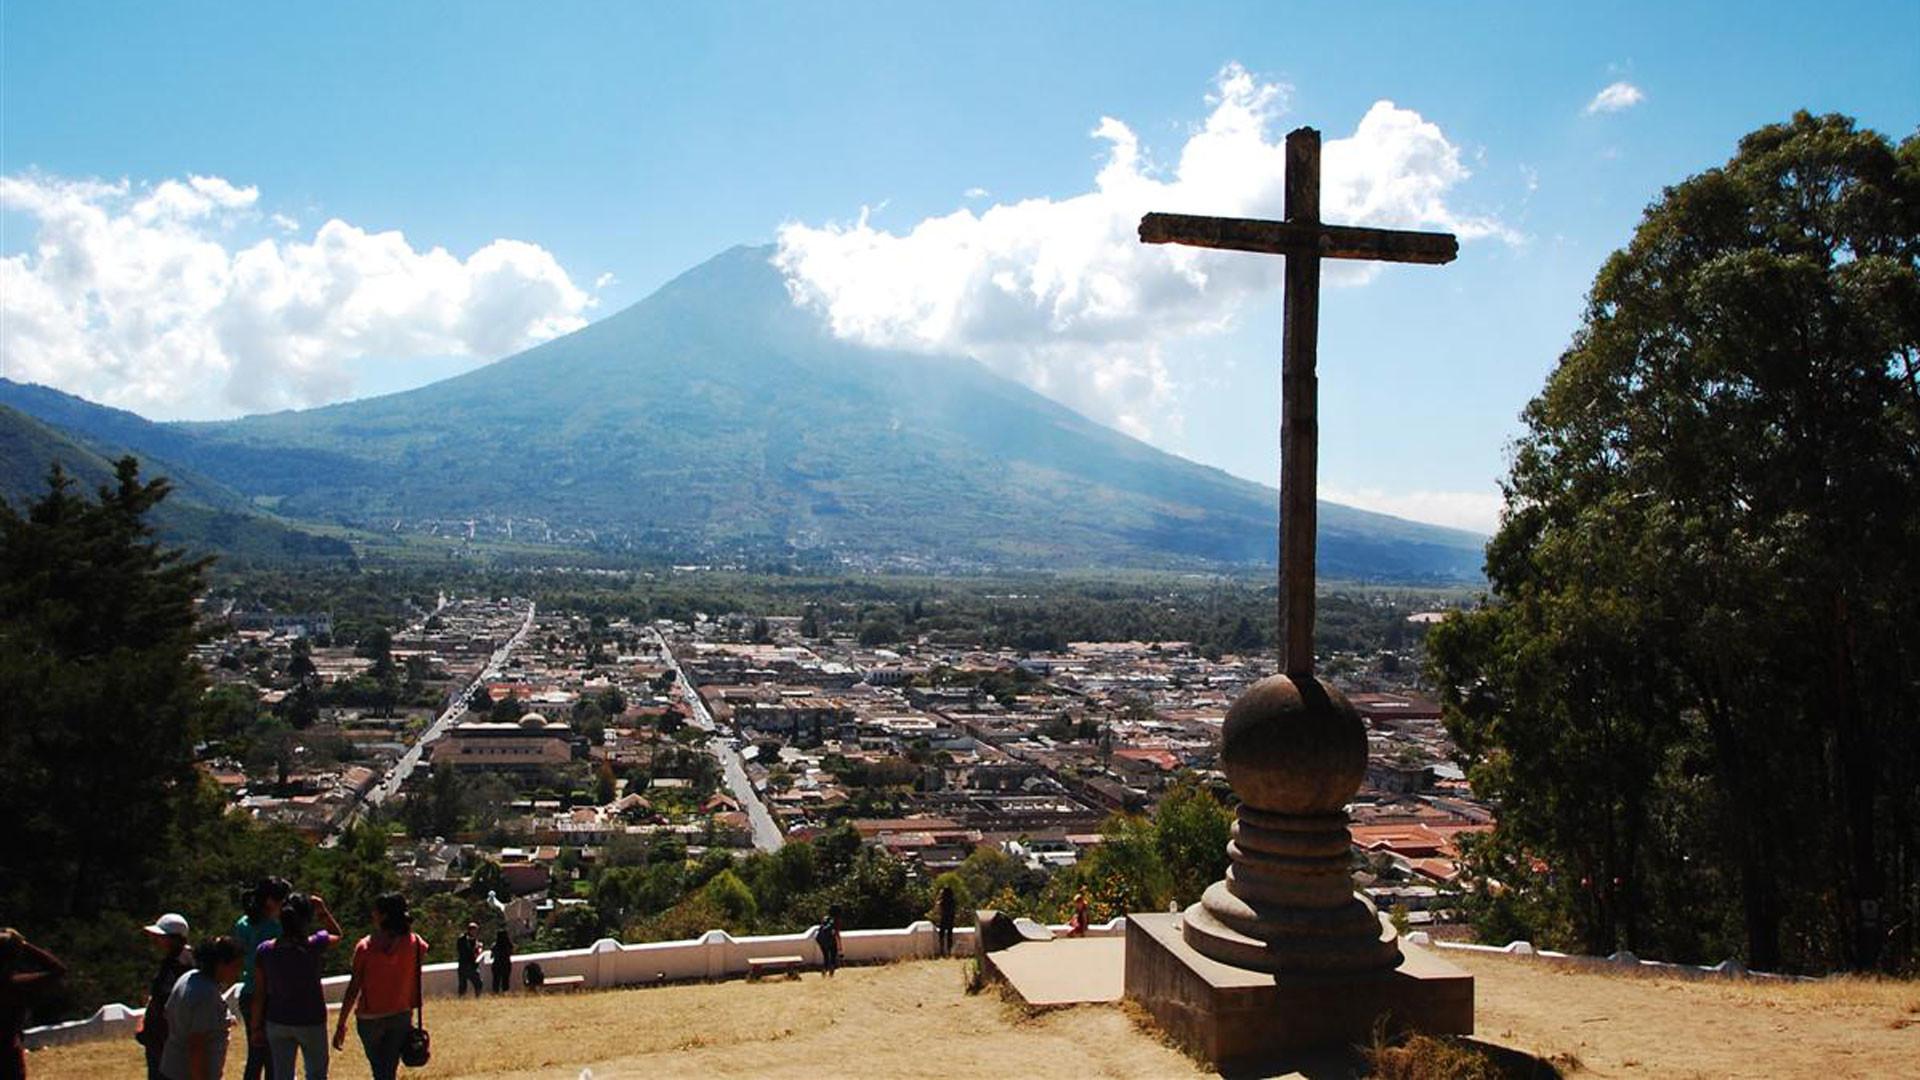 Guatemala Wallpaper 183 ① Wallpapertag